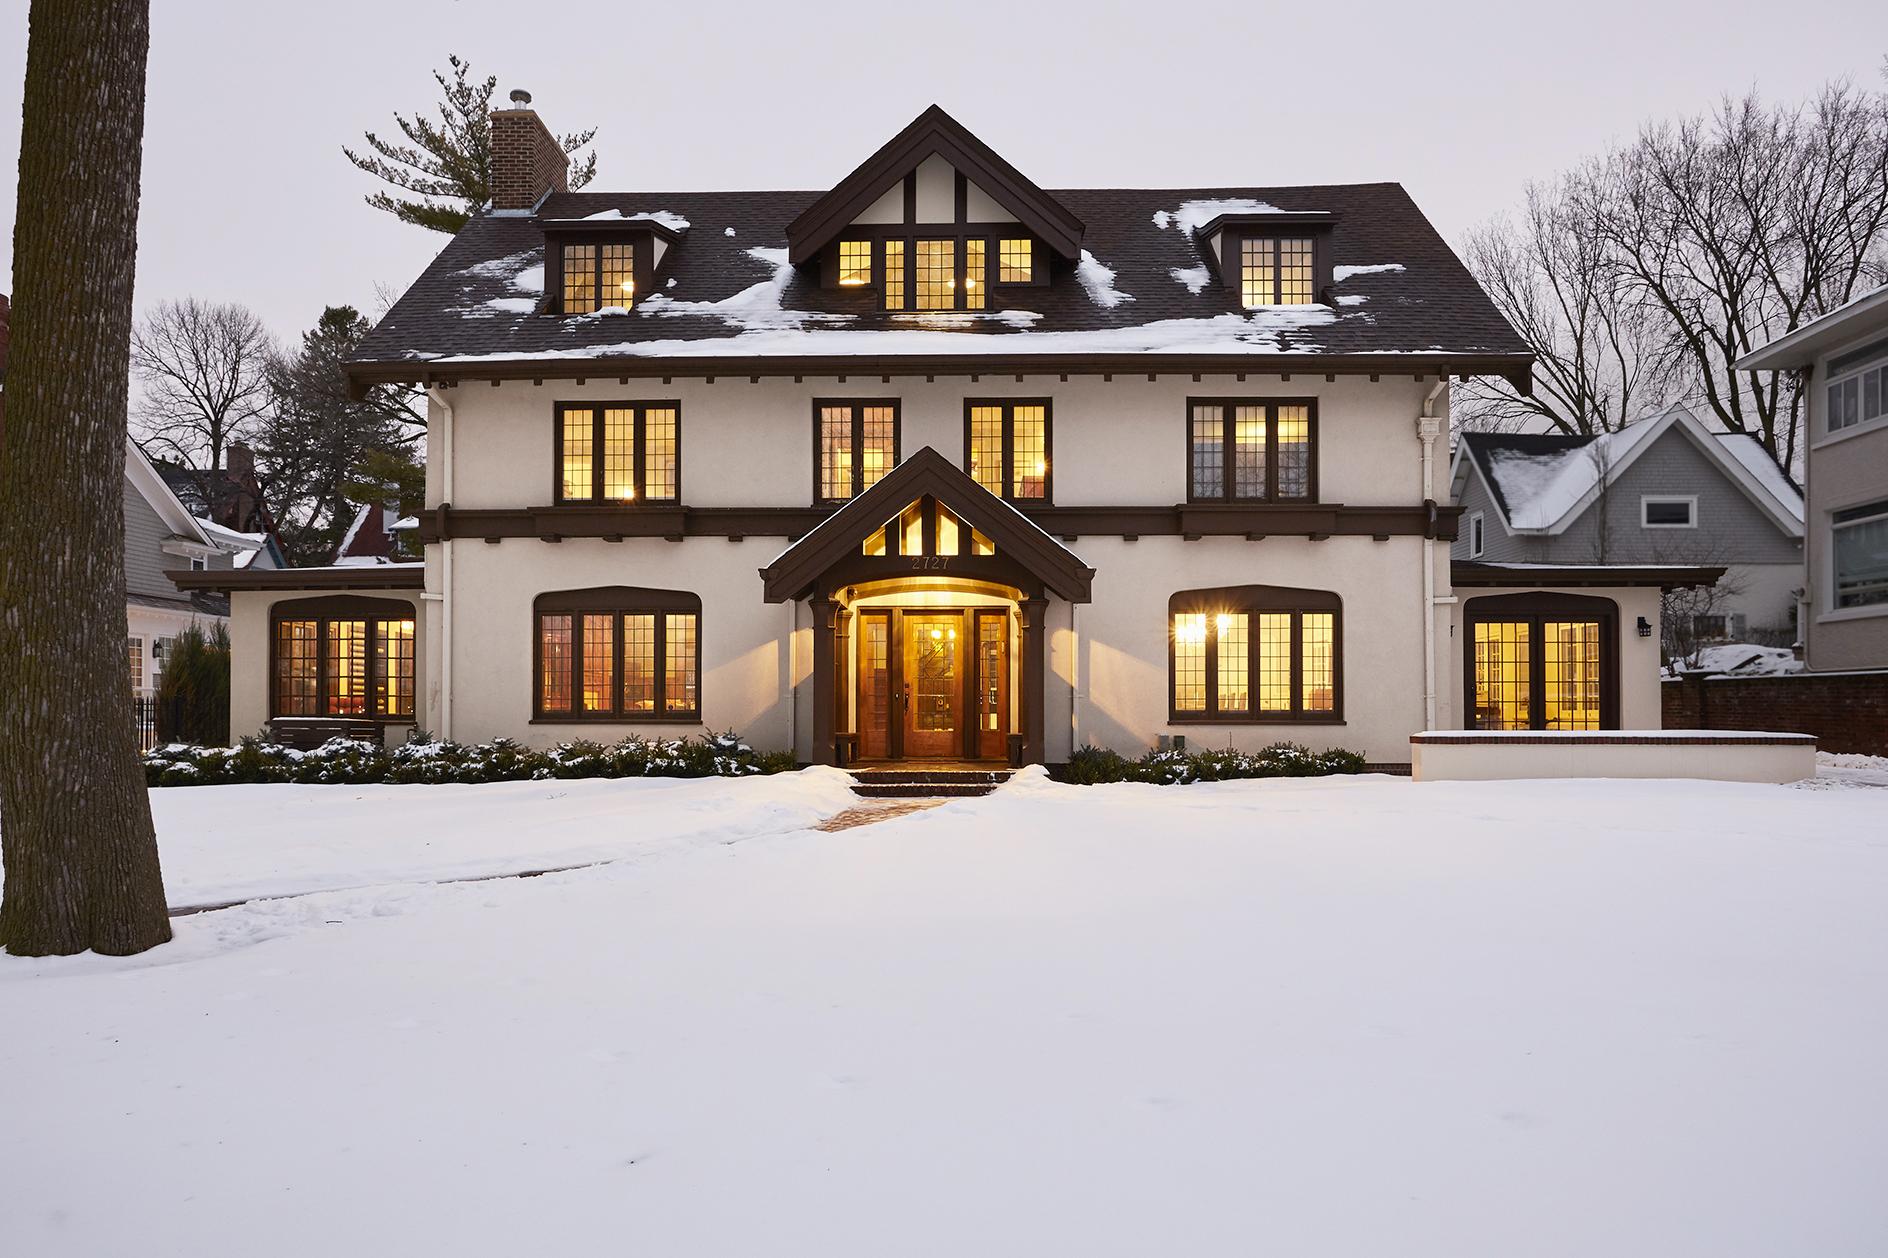 Big white house with dark wood paneling